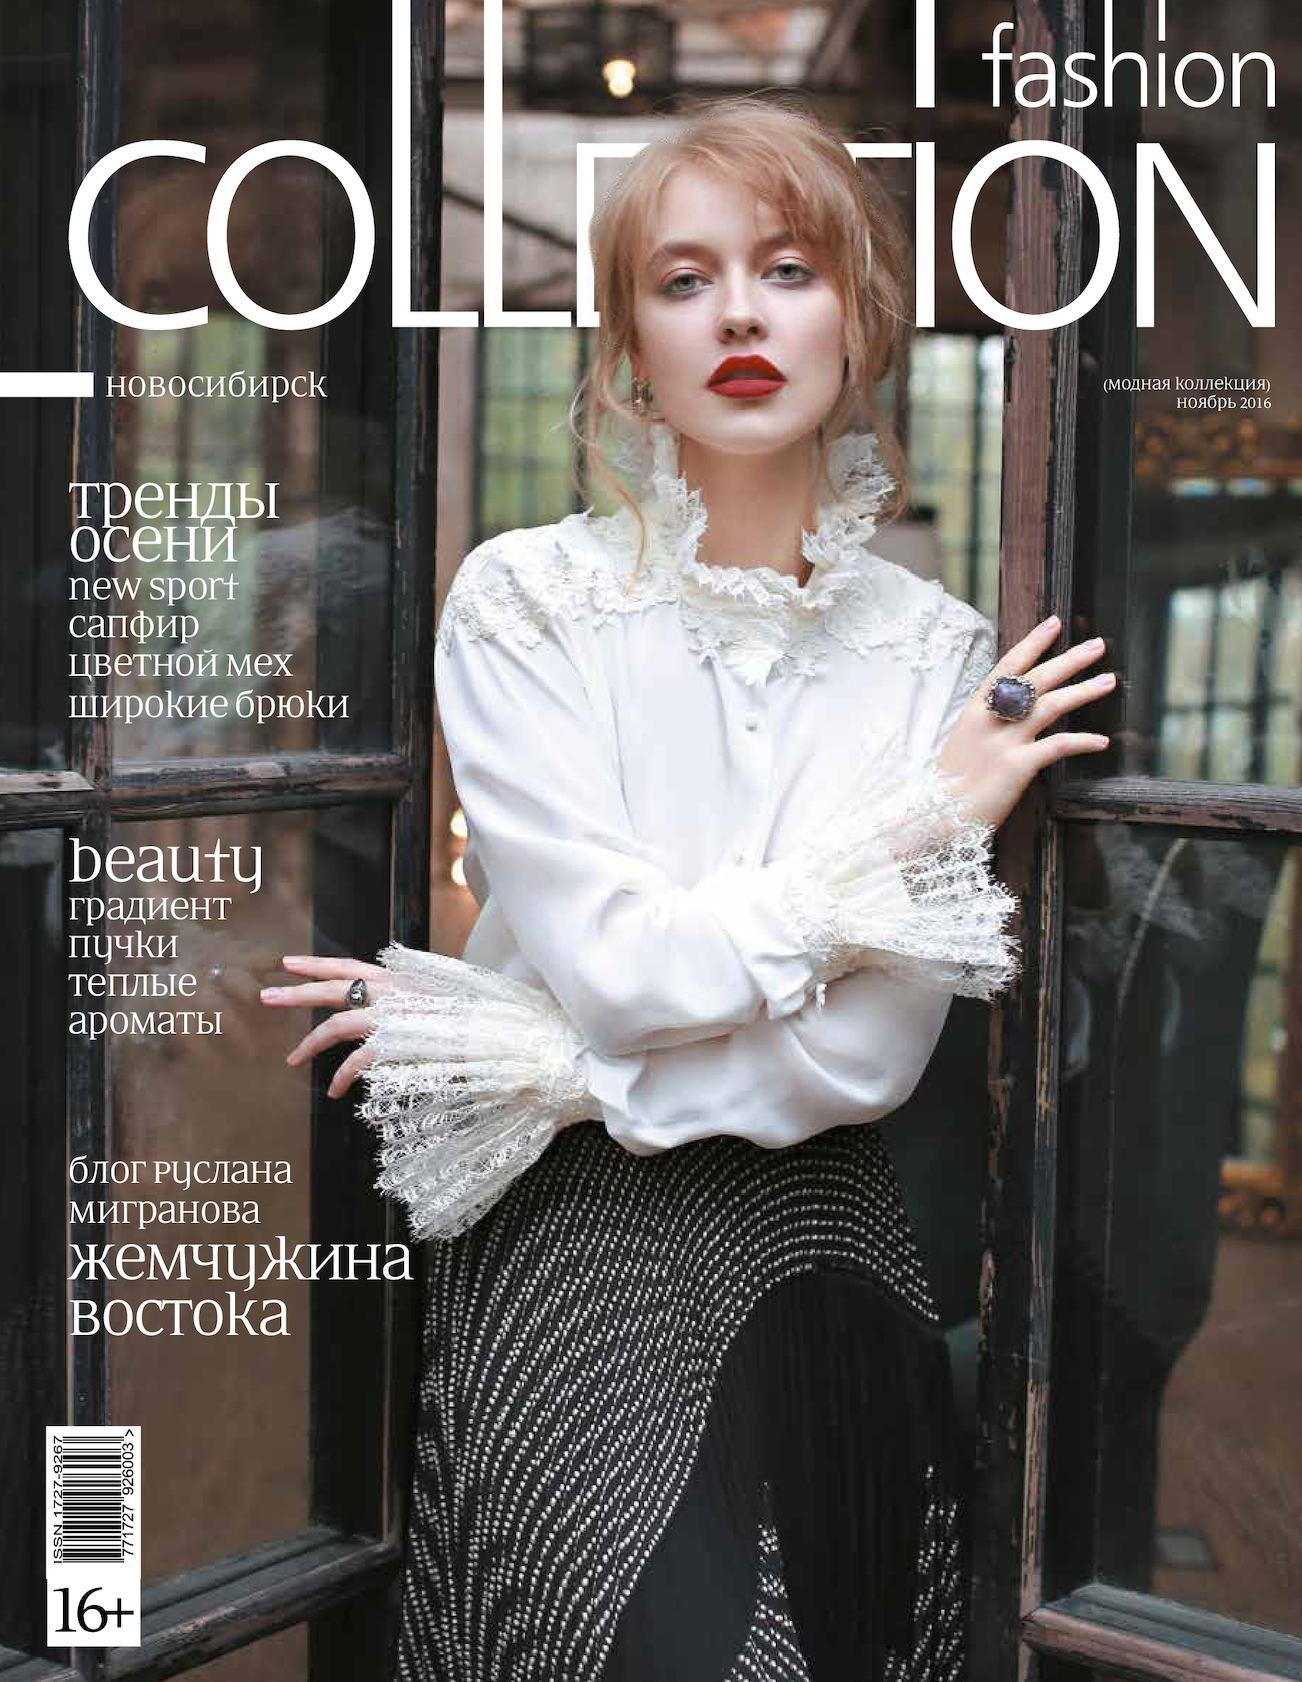 e67269286749 Calaméo - Fashion Collection Новосибирск, ноябрь 2016